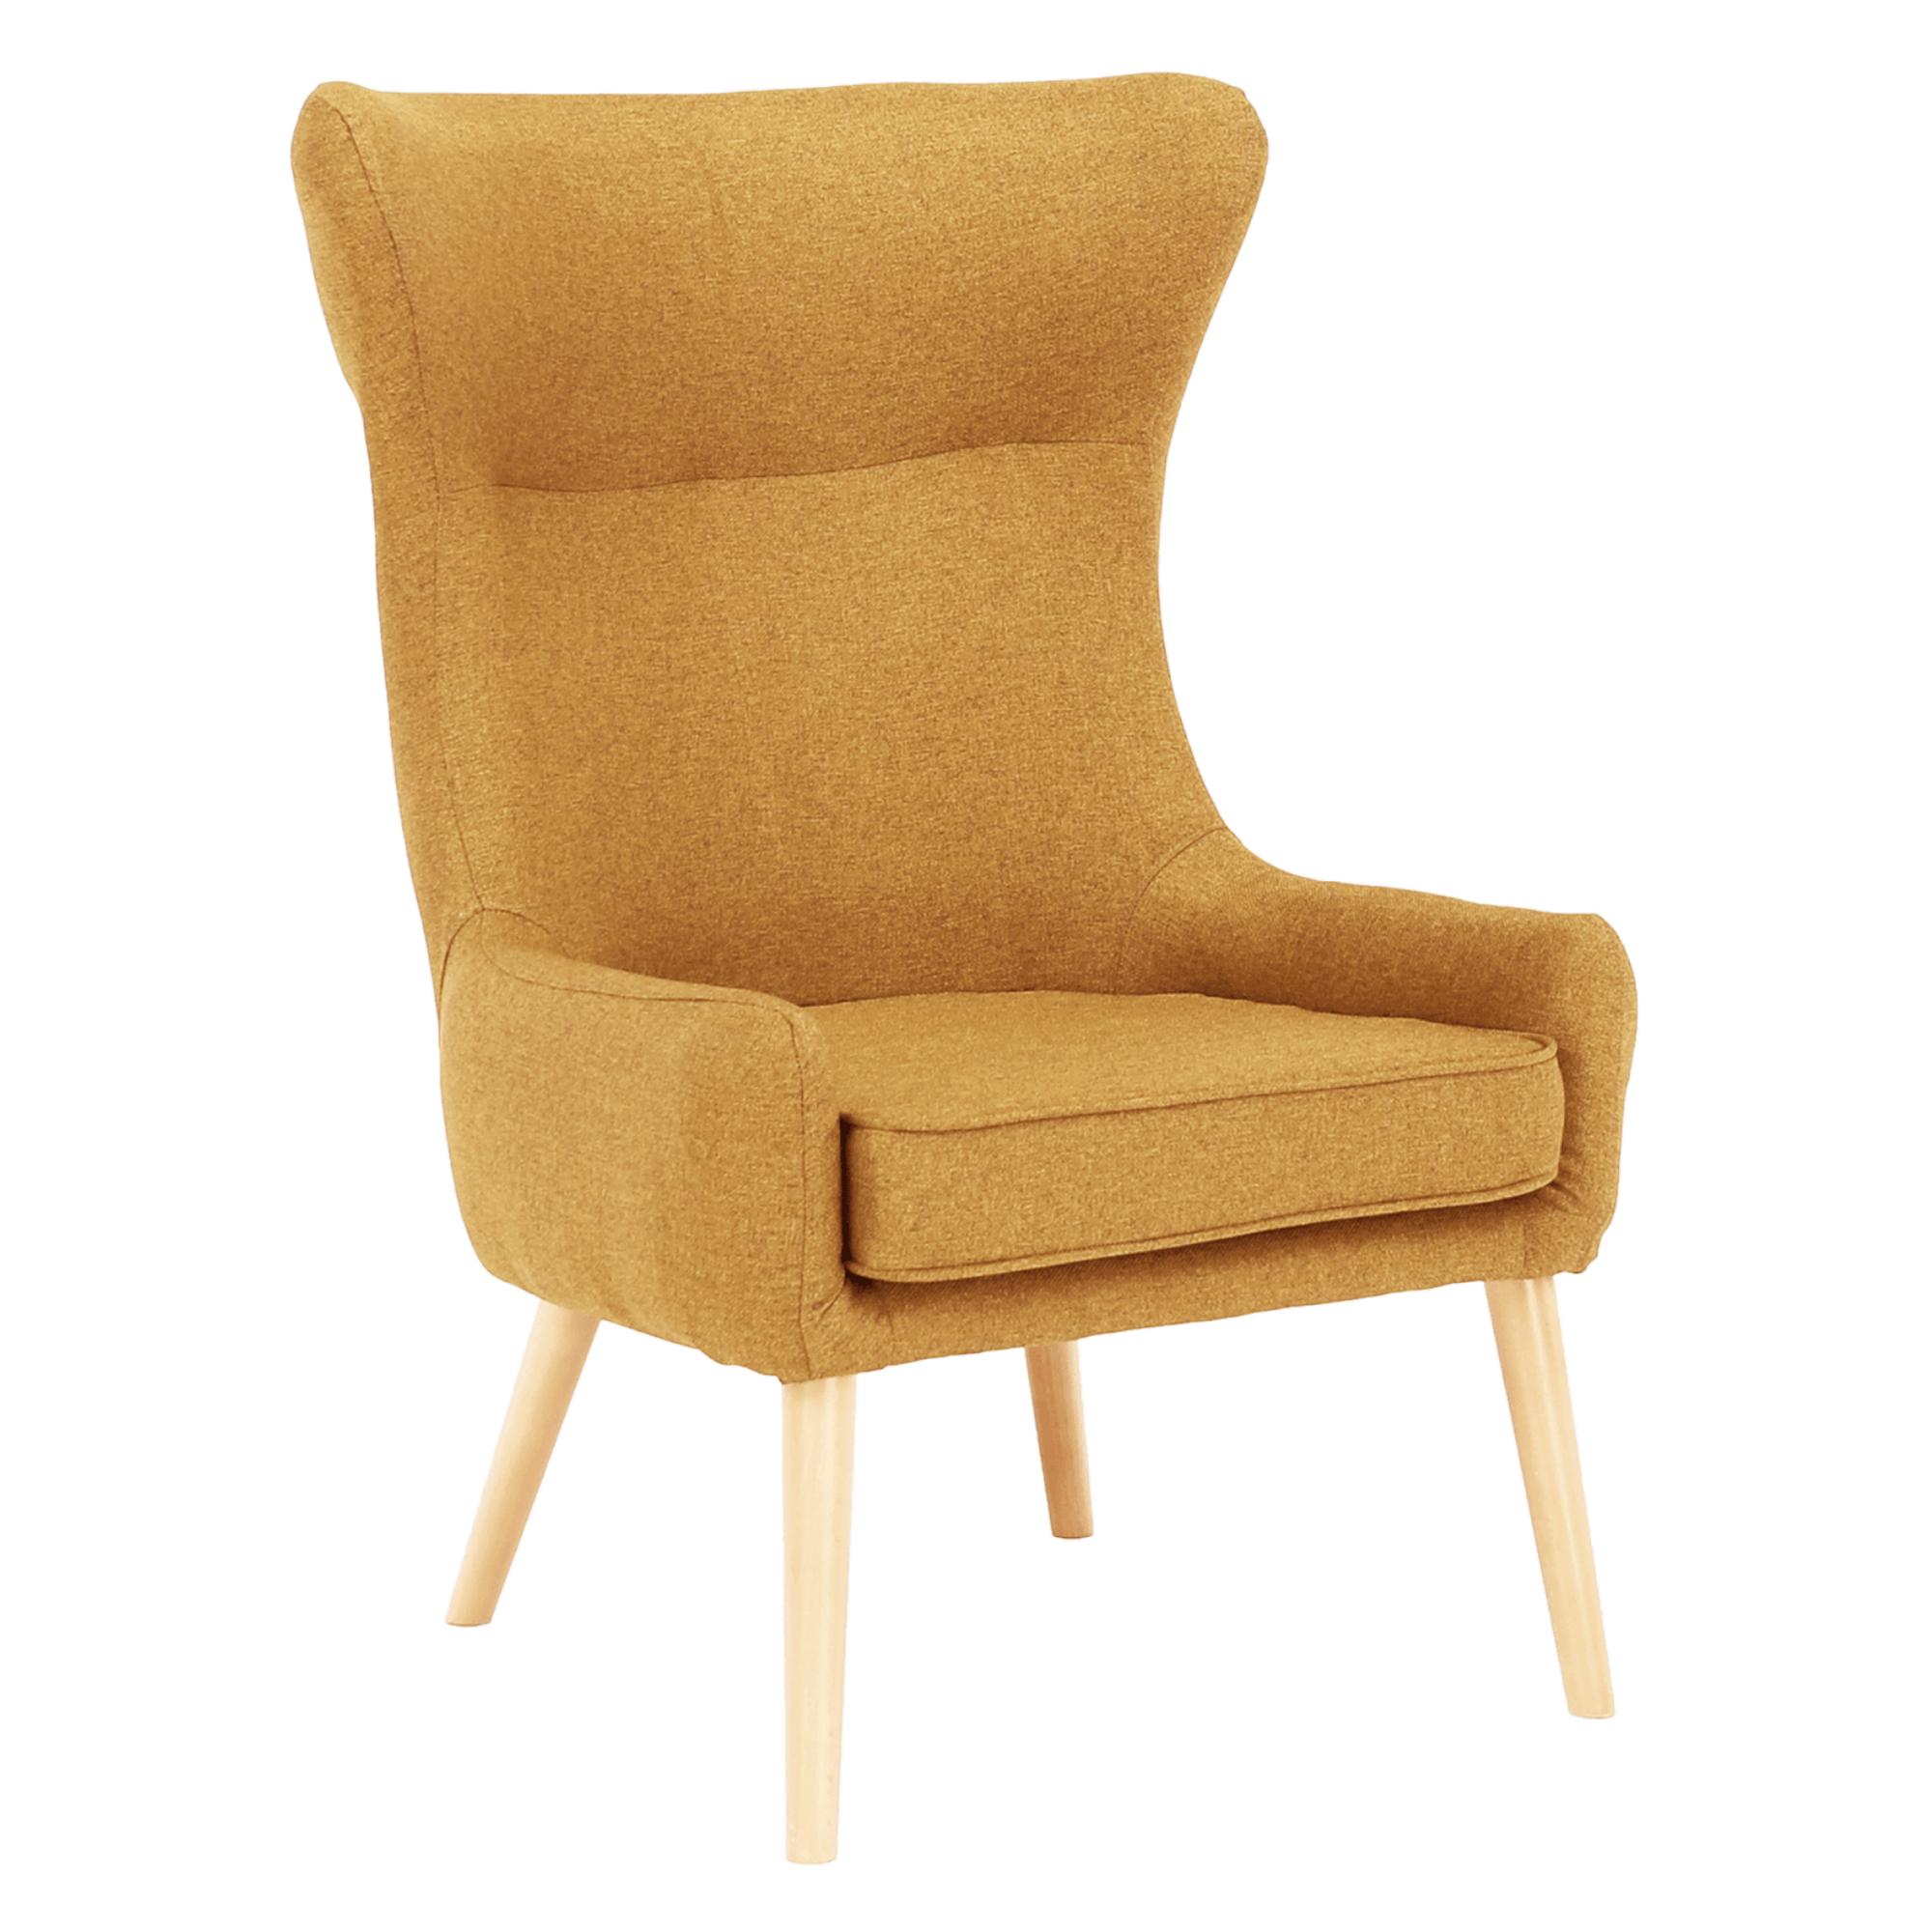 Füles fotel, mustár/bükkfa, FADOR